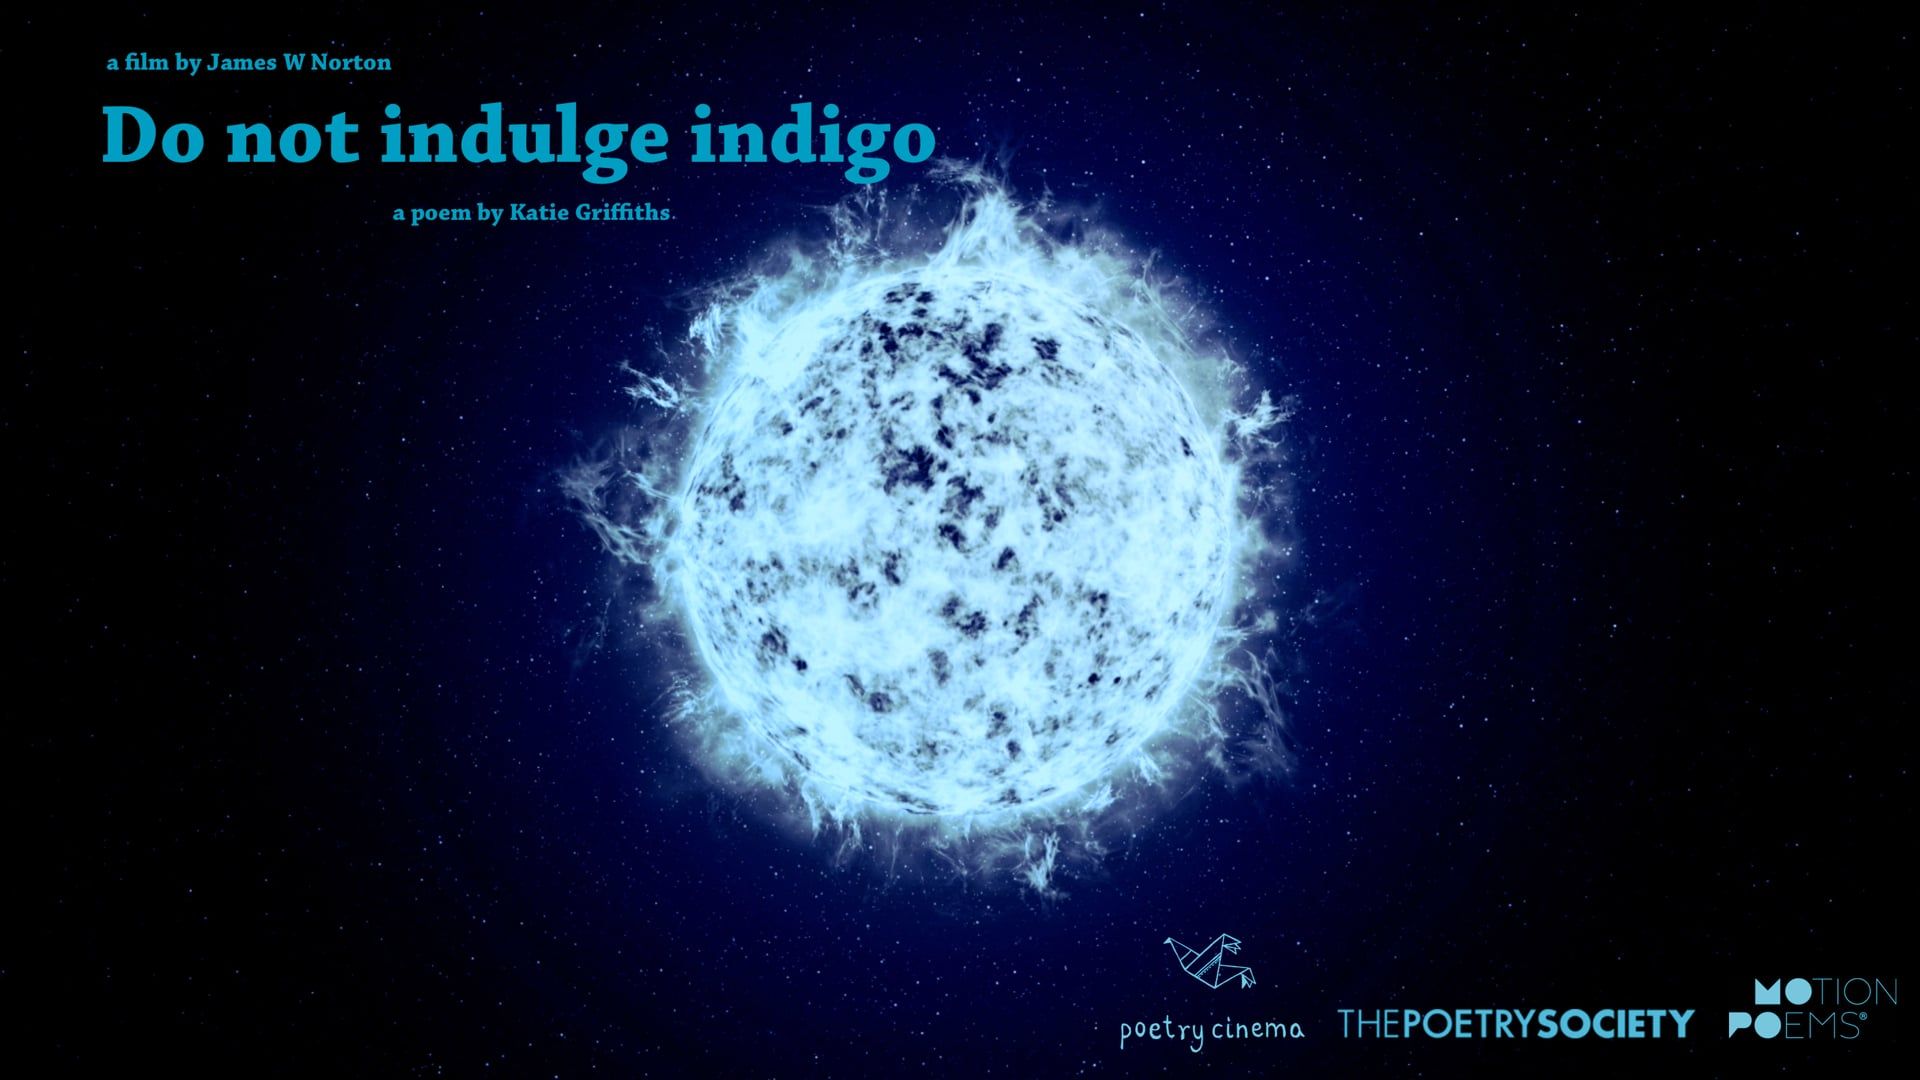 Do not indulge indigo   Poem by Katie Griffith   Film by James W. Norton